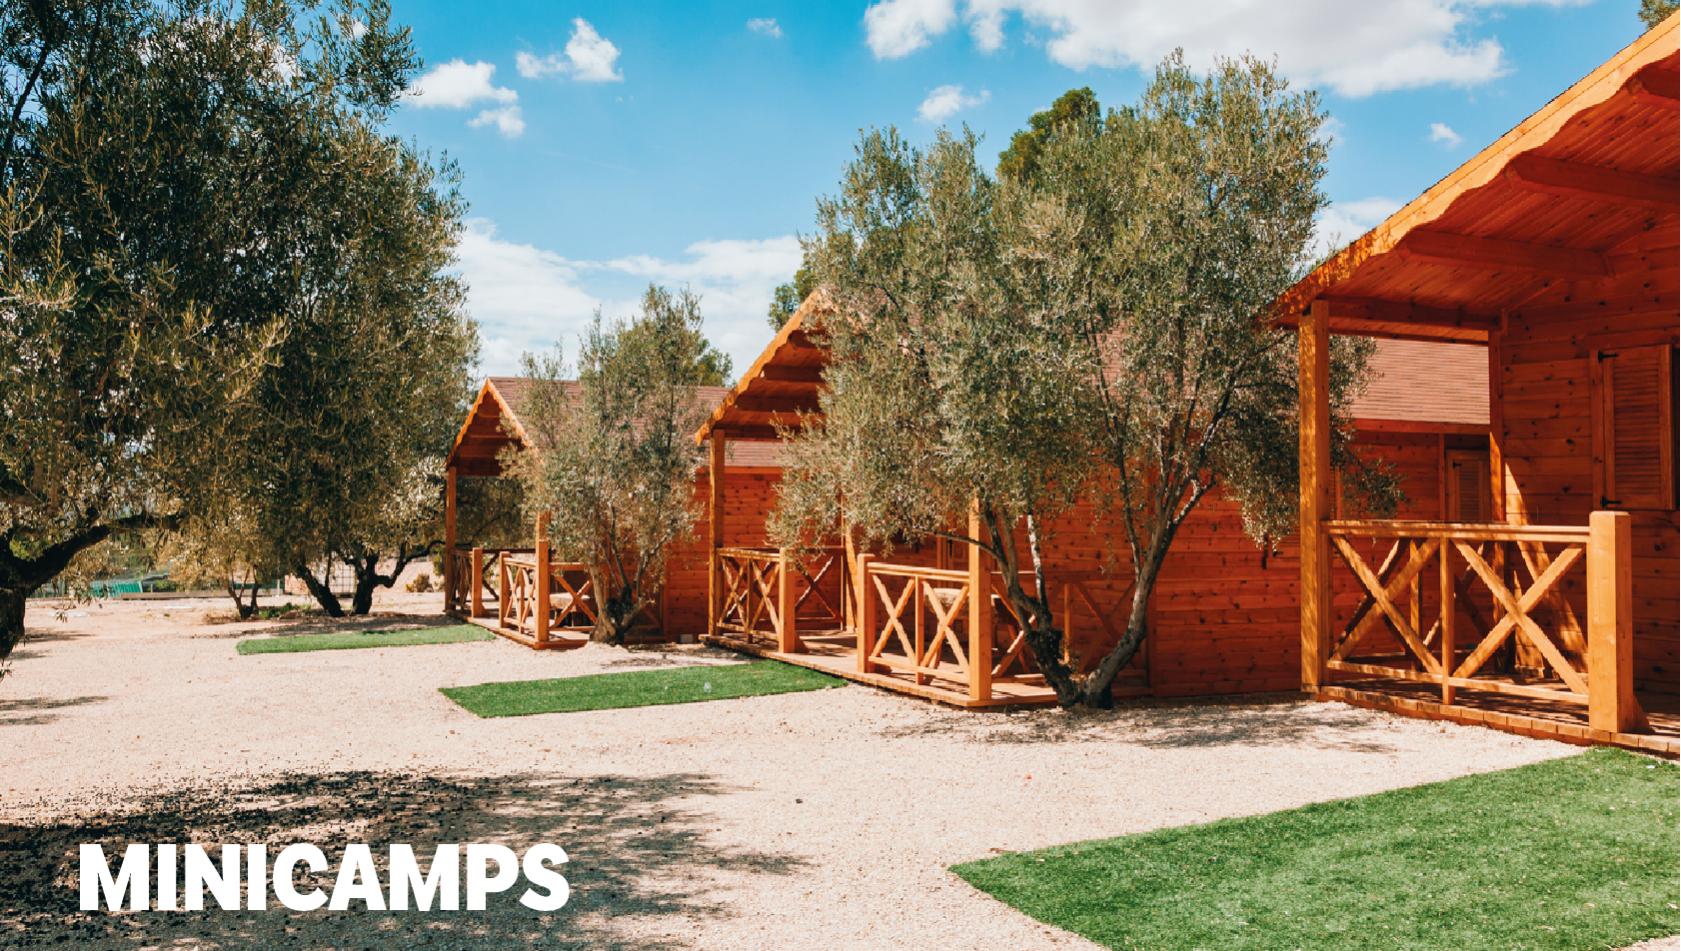 Minicamps